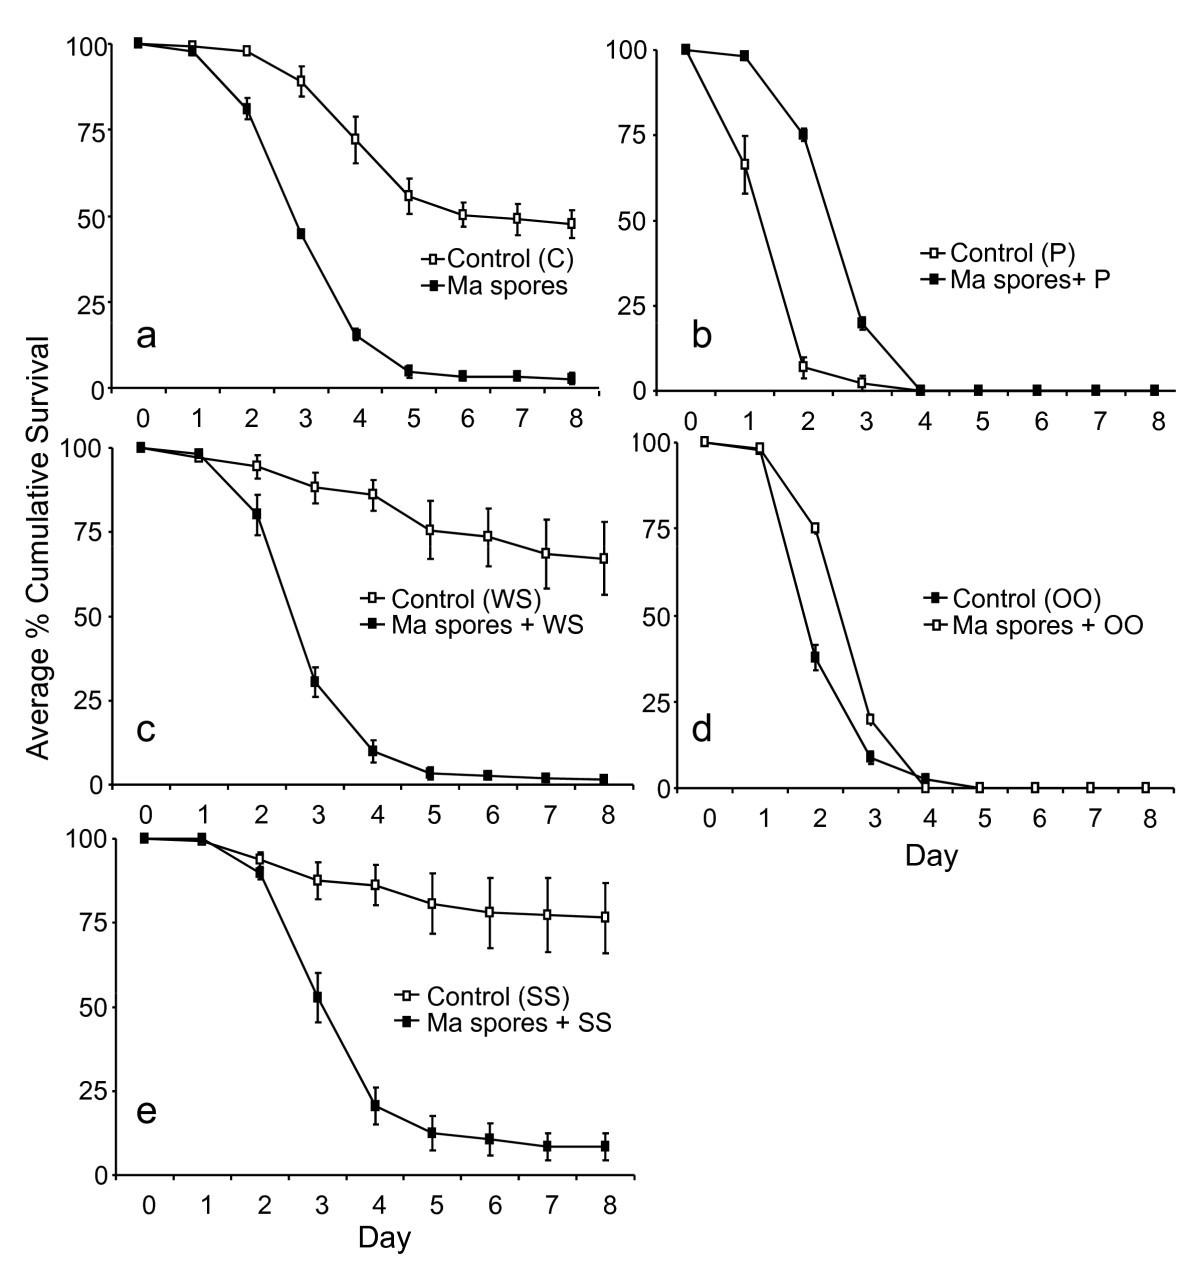 Development Of Metarhizium Anisopliae And Beauveria Bassiana To Build Environmentallyfriendly Mosquito Repeller Circuit Diagram Figure 2